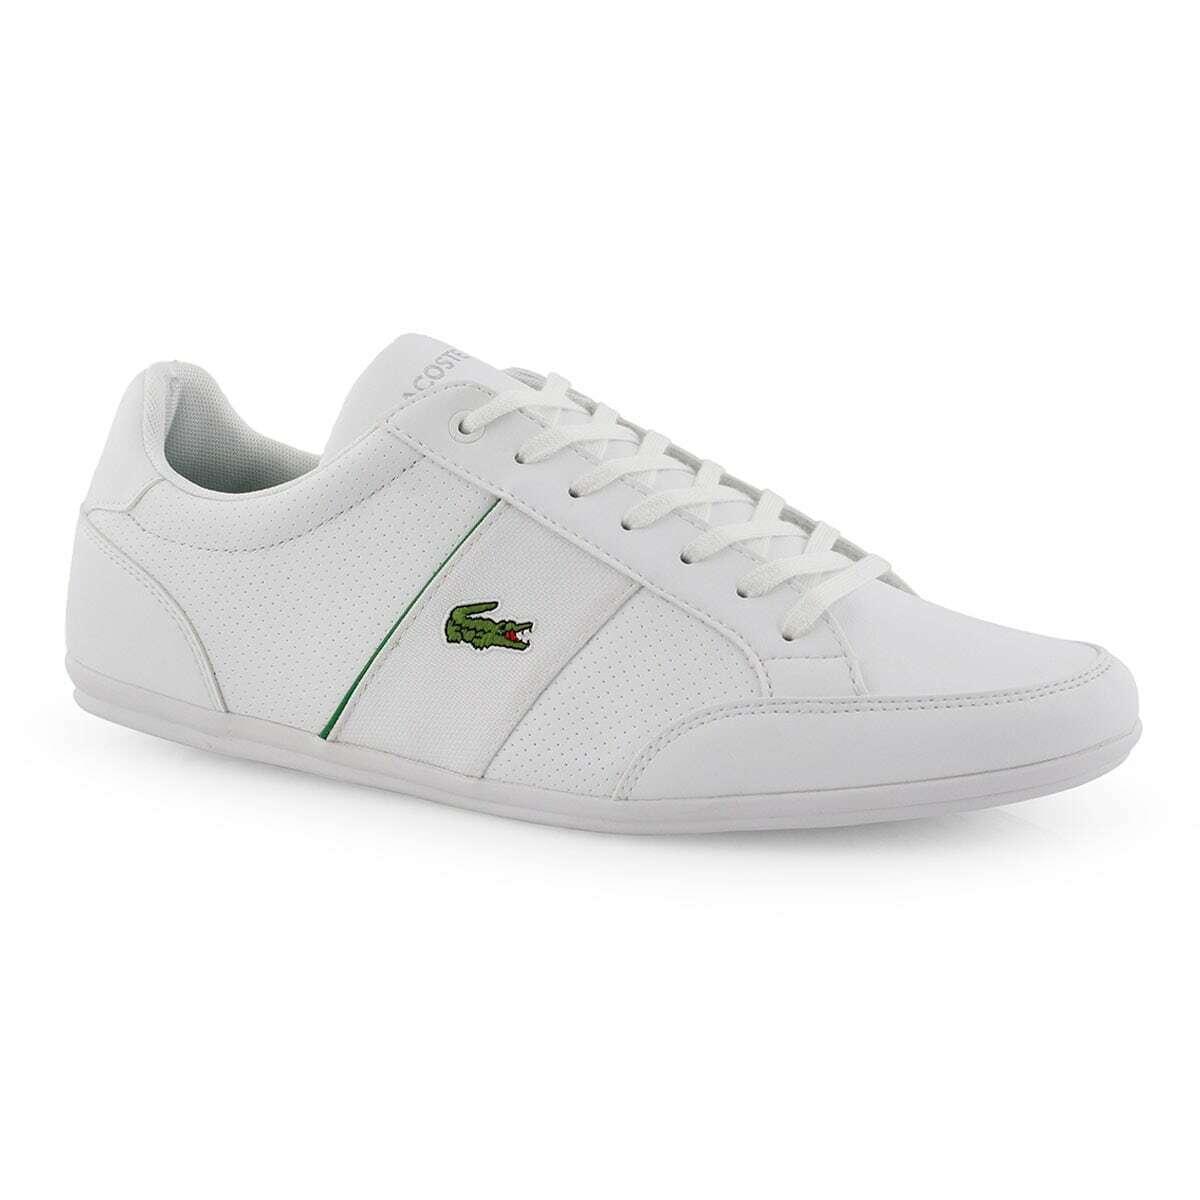 Lacoste Men's Nivolor 119 1 P Fashion Sneaker